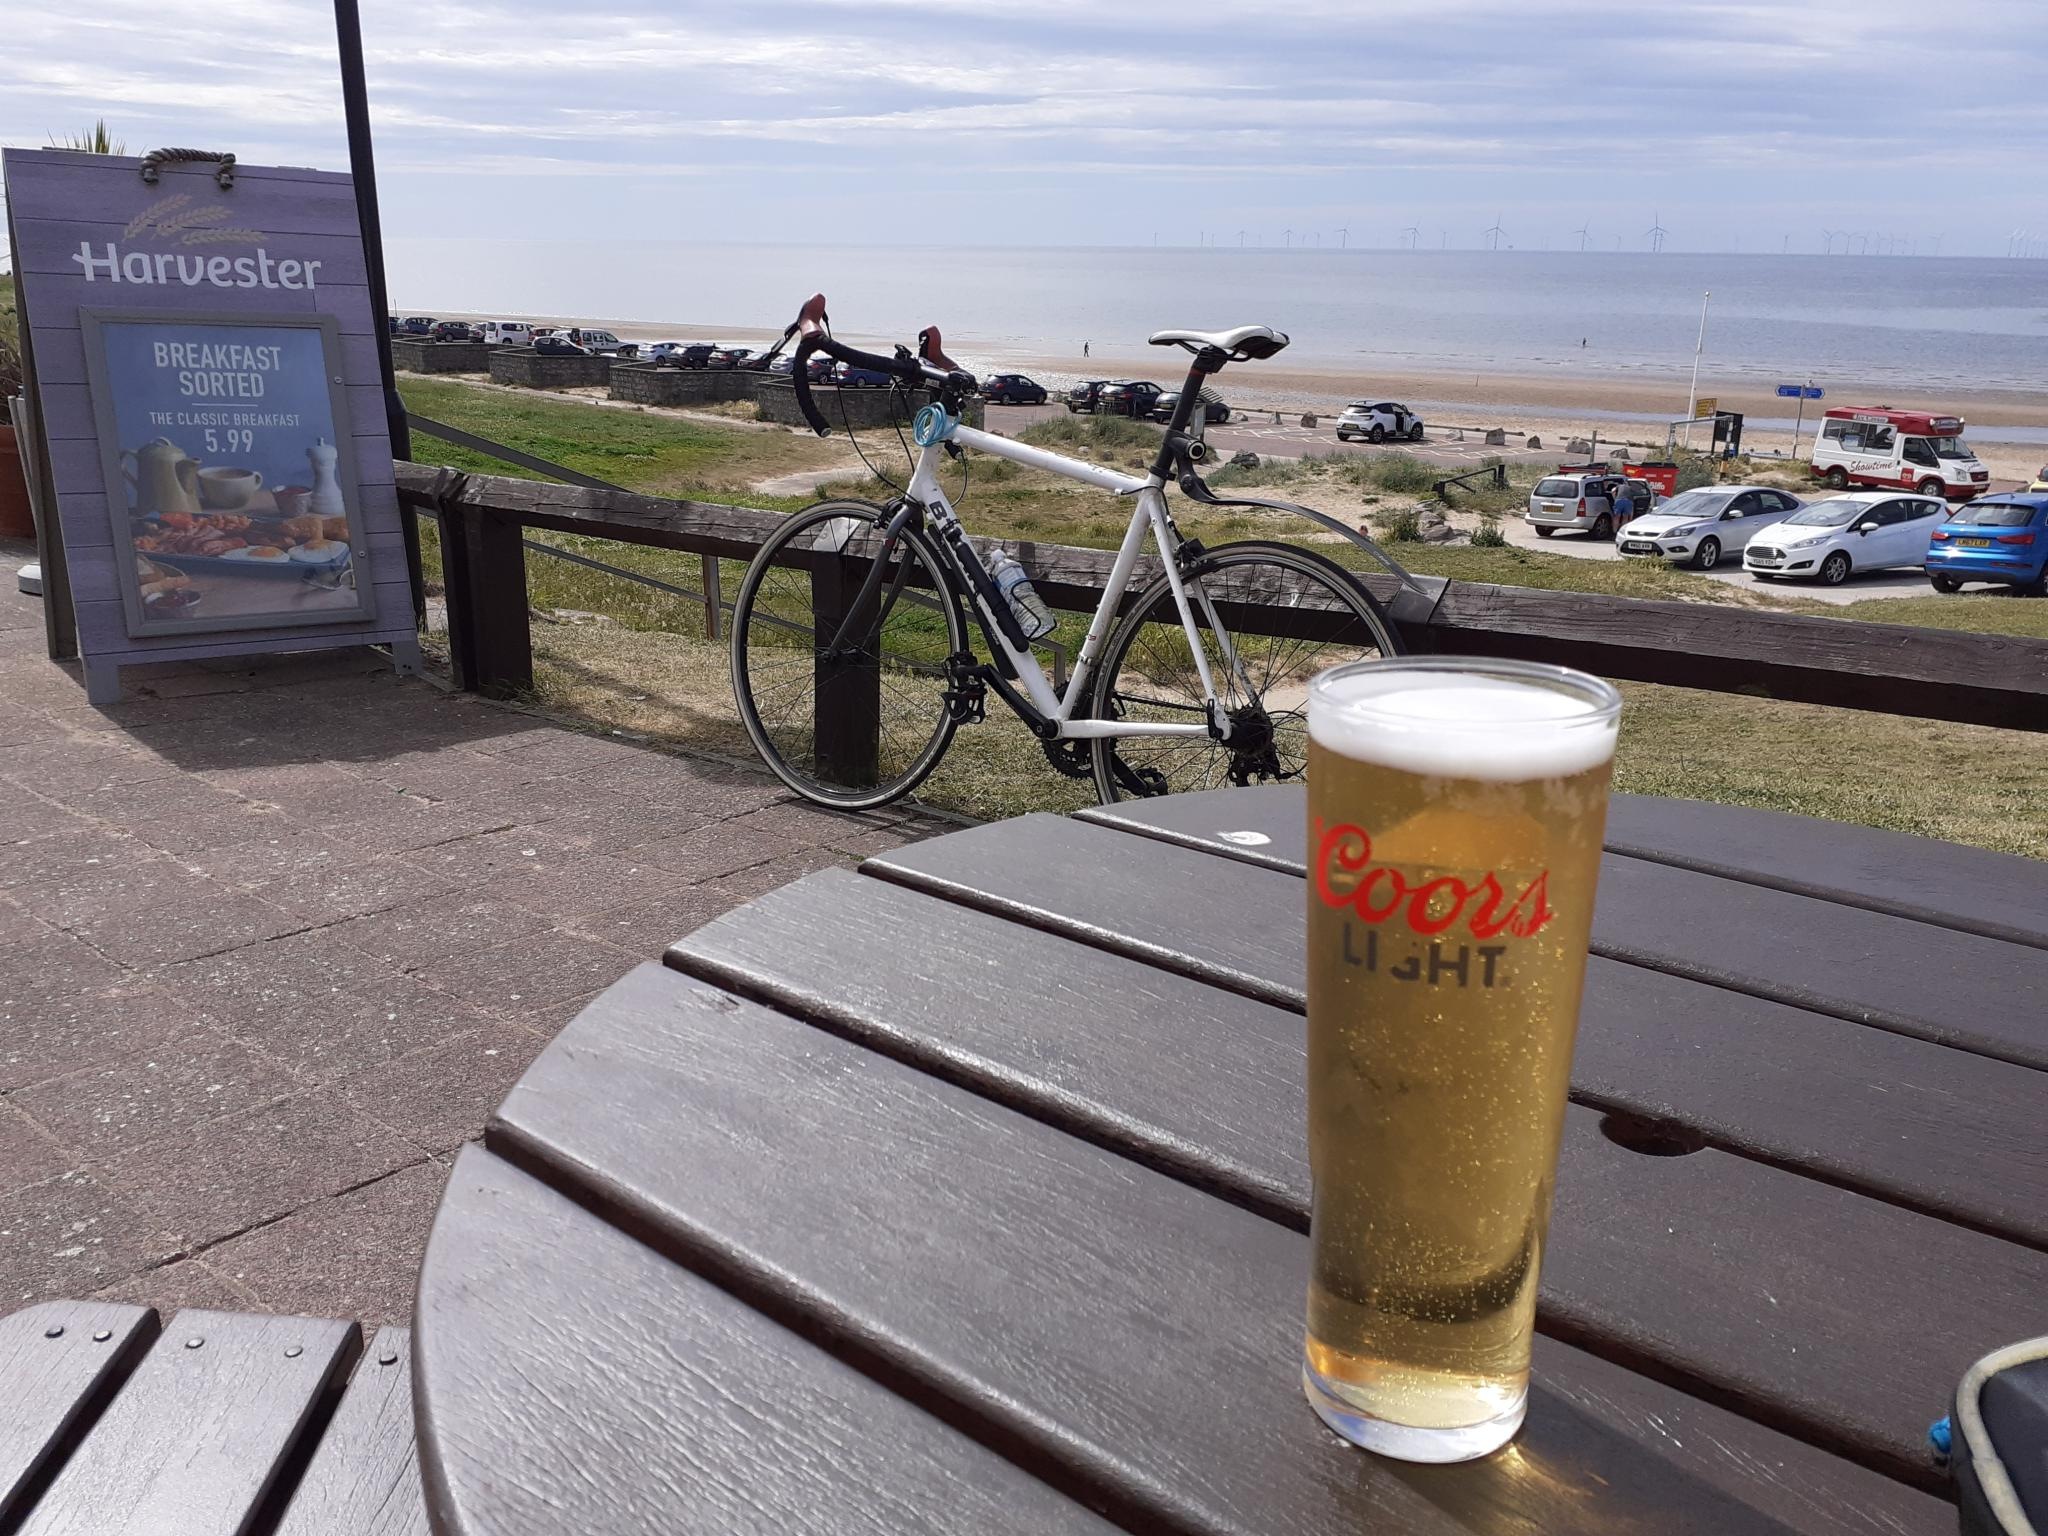 On my bike-20210615_155844-jpg